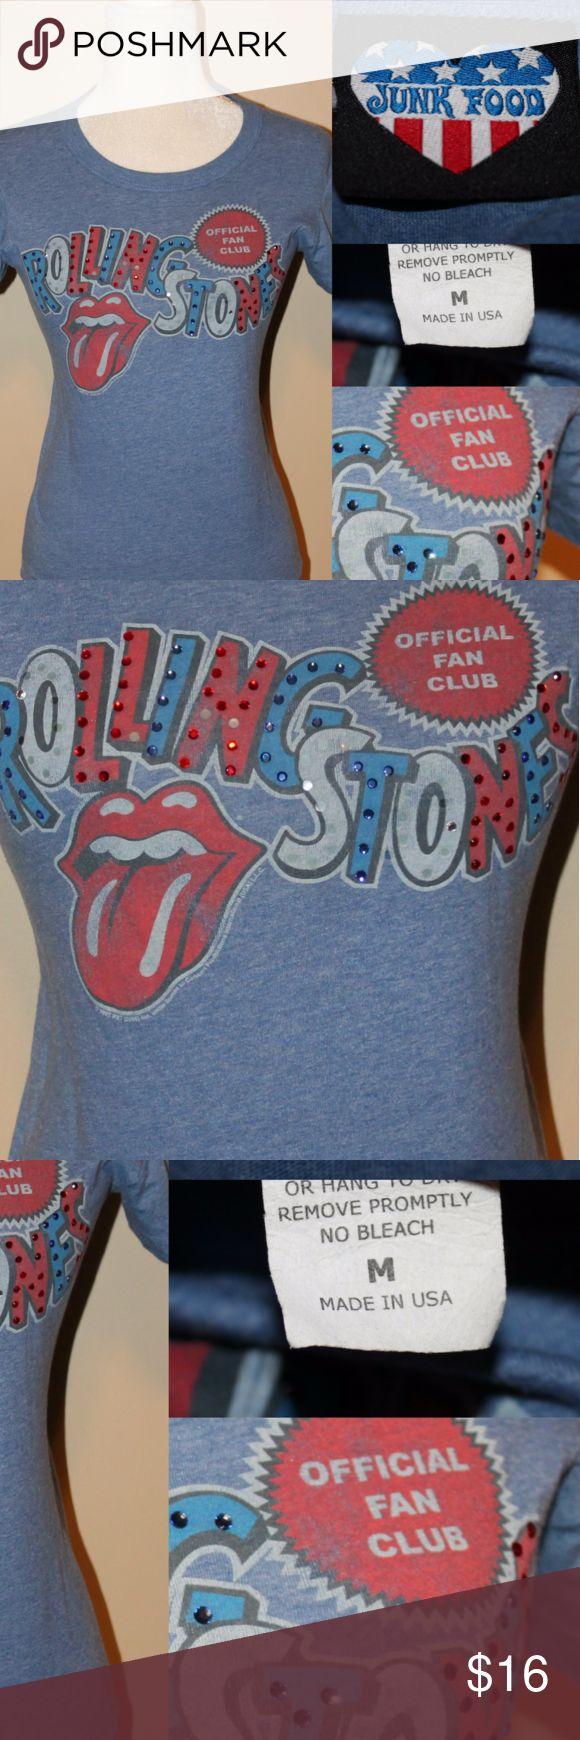 "JUNK FOOD Short Sleeve T shirt ""Rolling Stones"" Rhinestone embellished short sleeve t shirt ""rolling stones"" Junk Food Clothing Tops Tees - Short Sleeve"